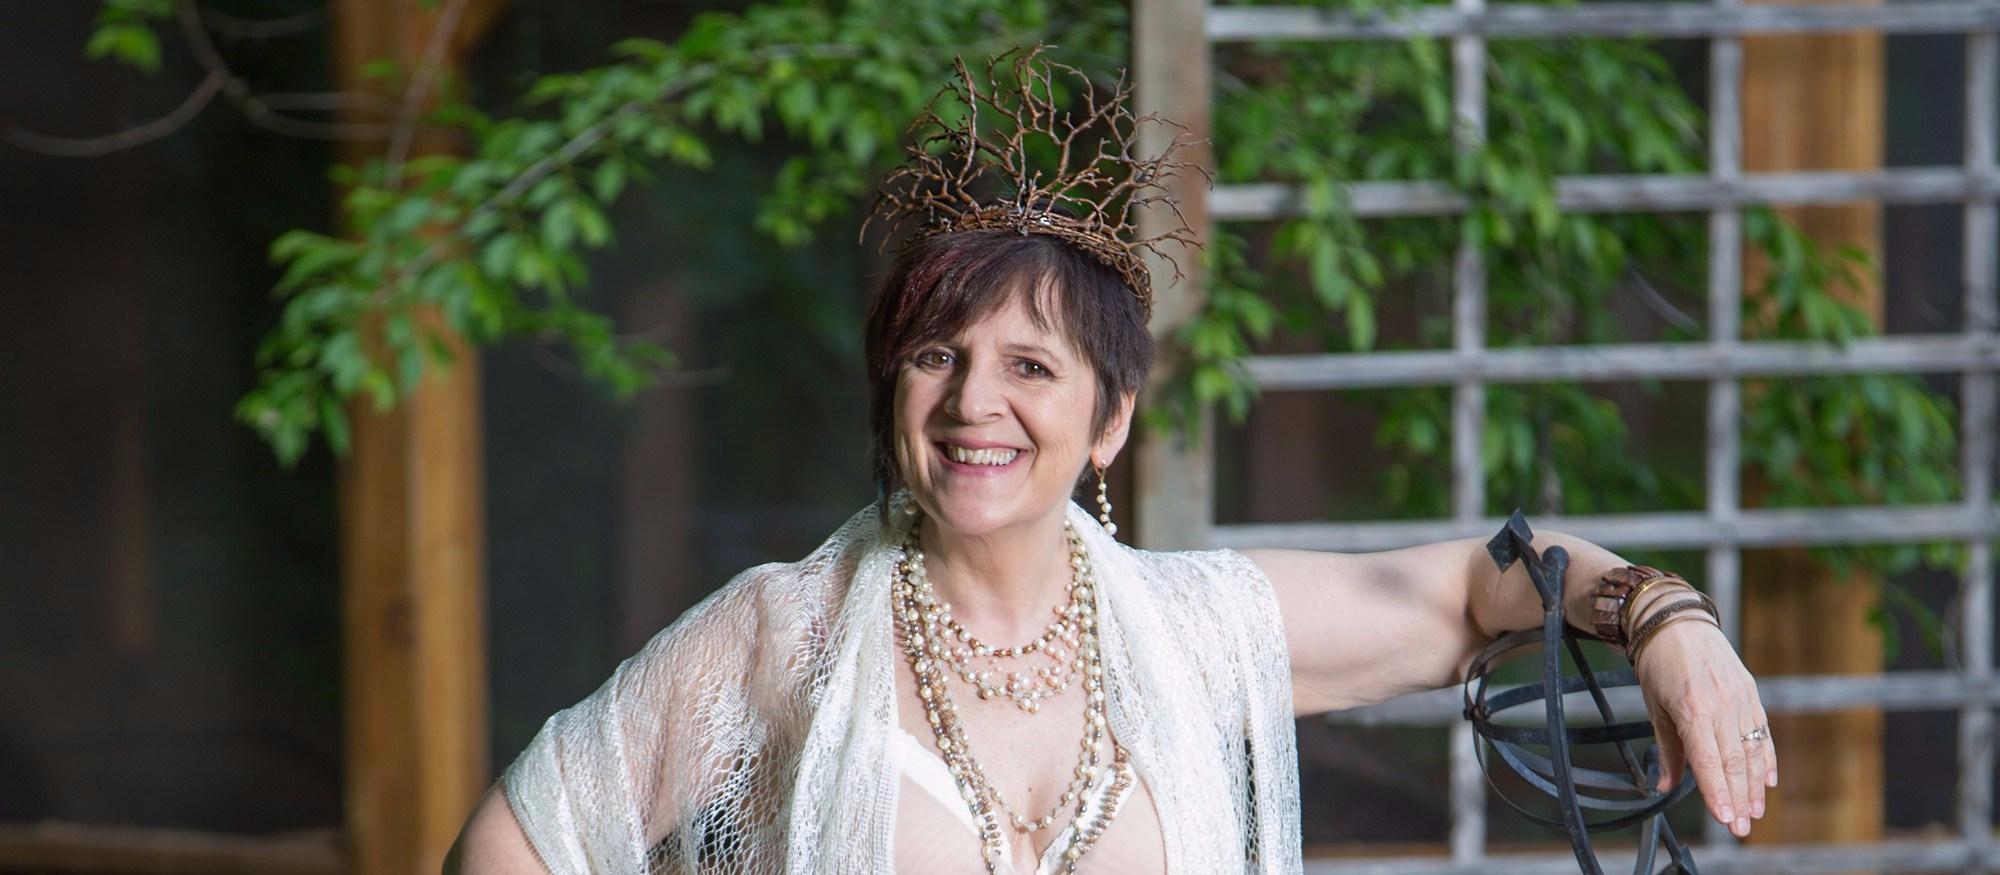 photo of Diane Miller - the Goddess behind Goddess Be Me